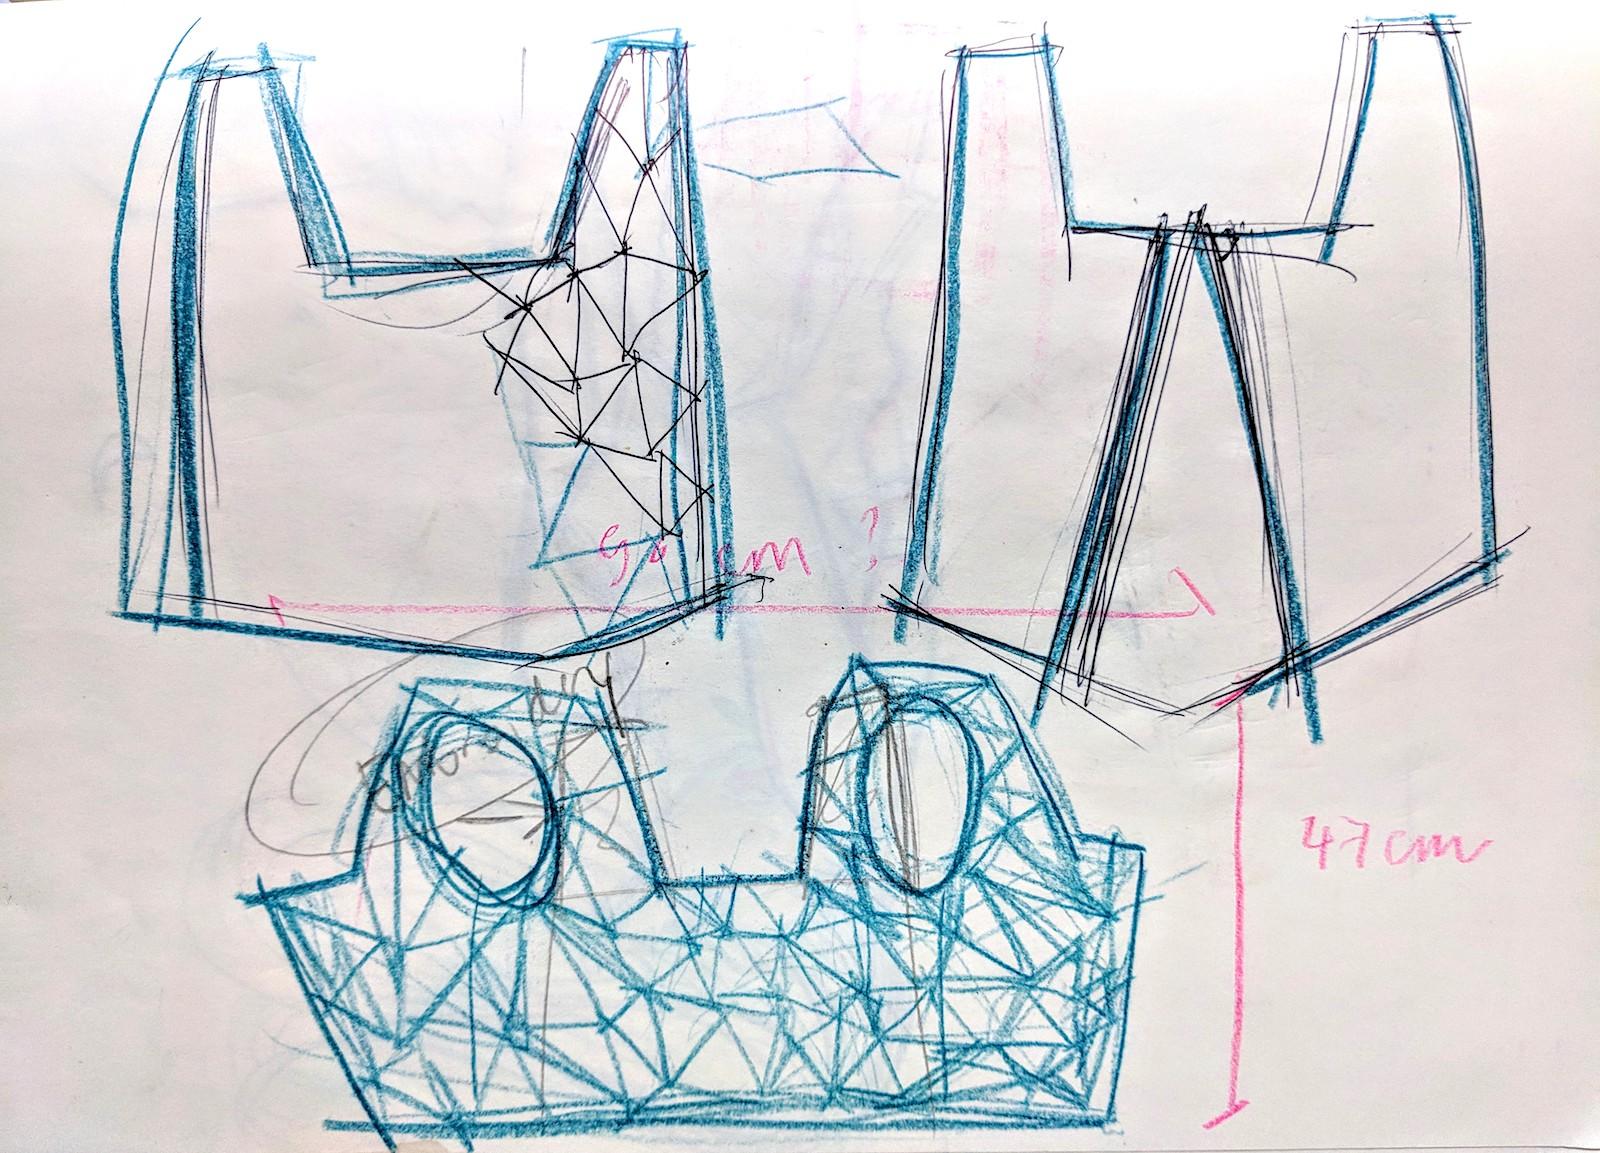 W7_Jutemadera sketch.jpg